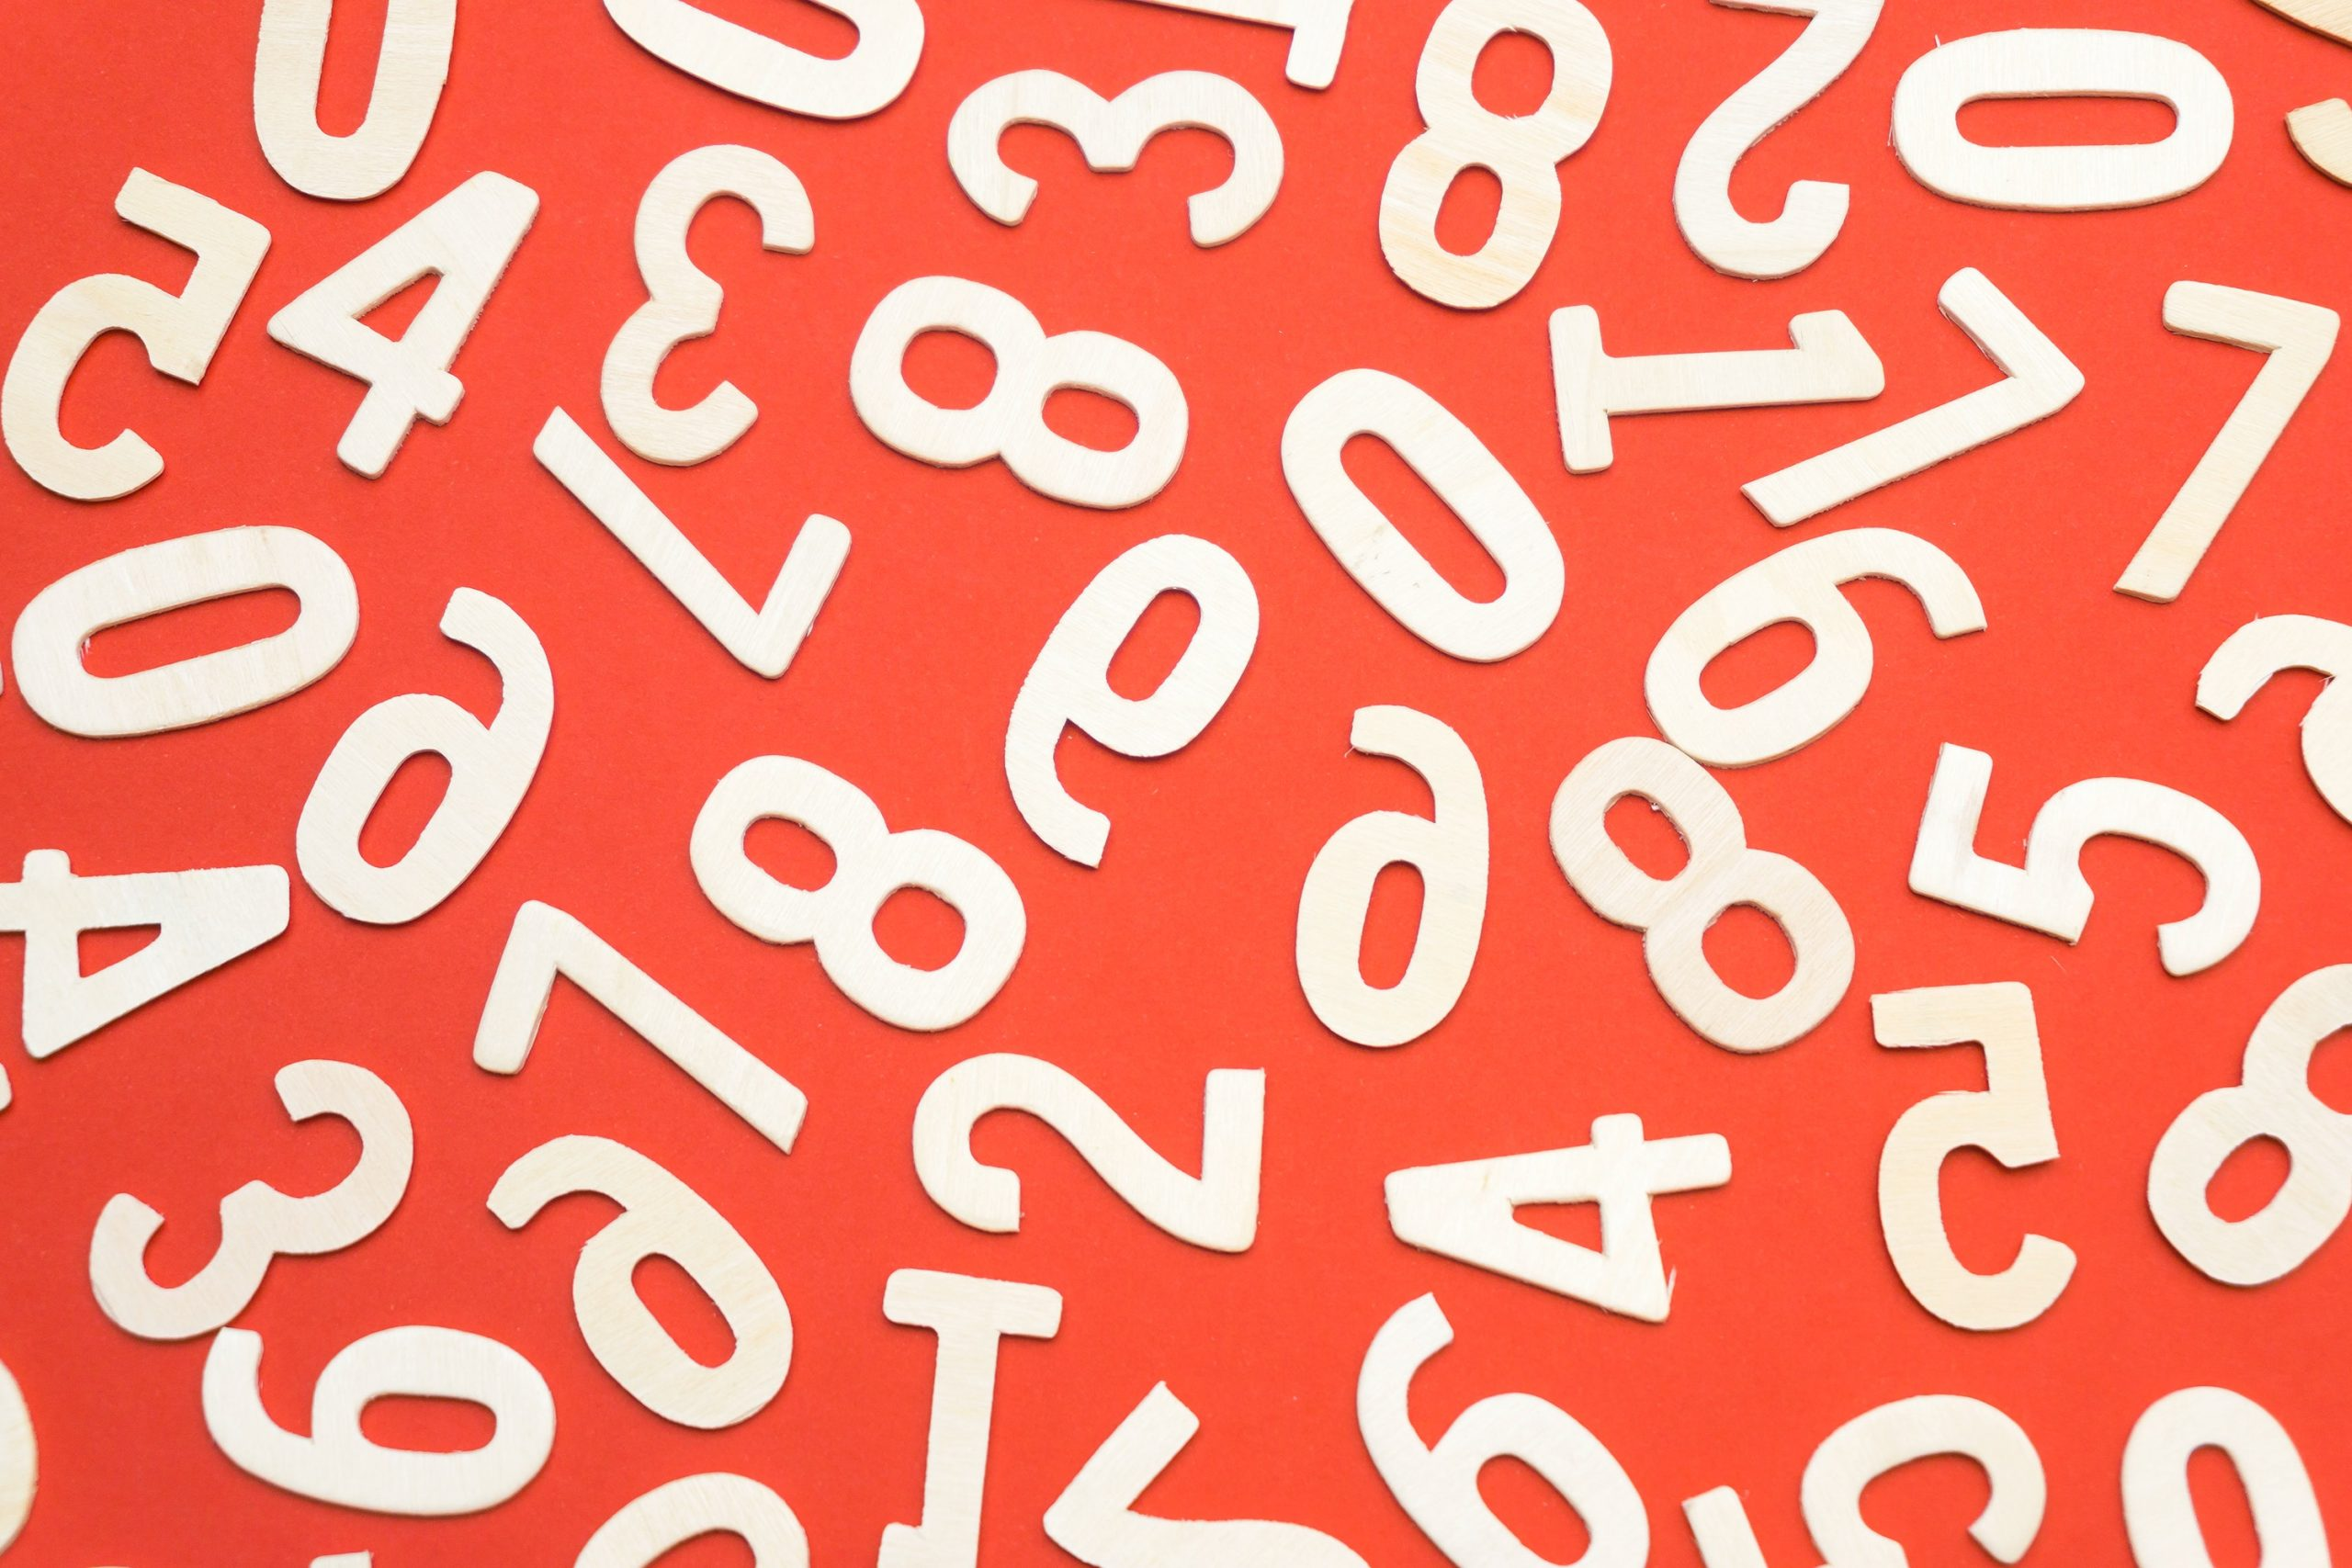 lots-of-numbers-1314543